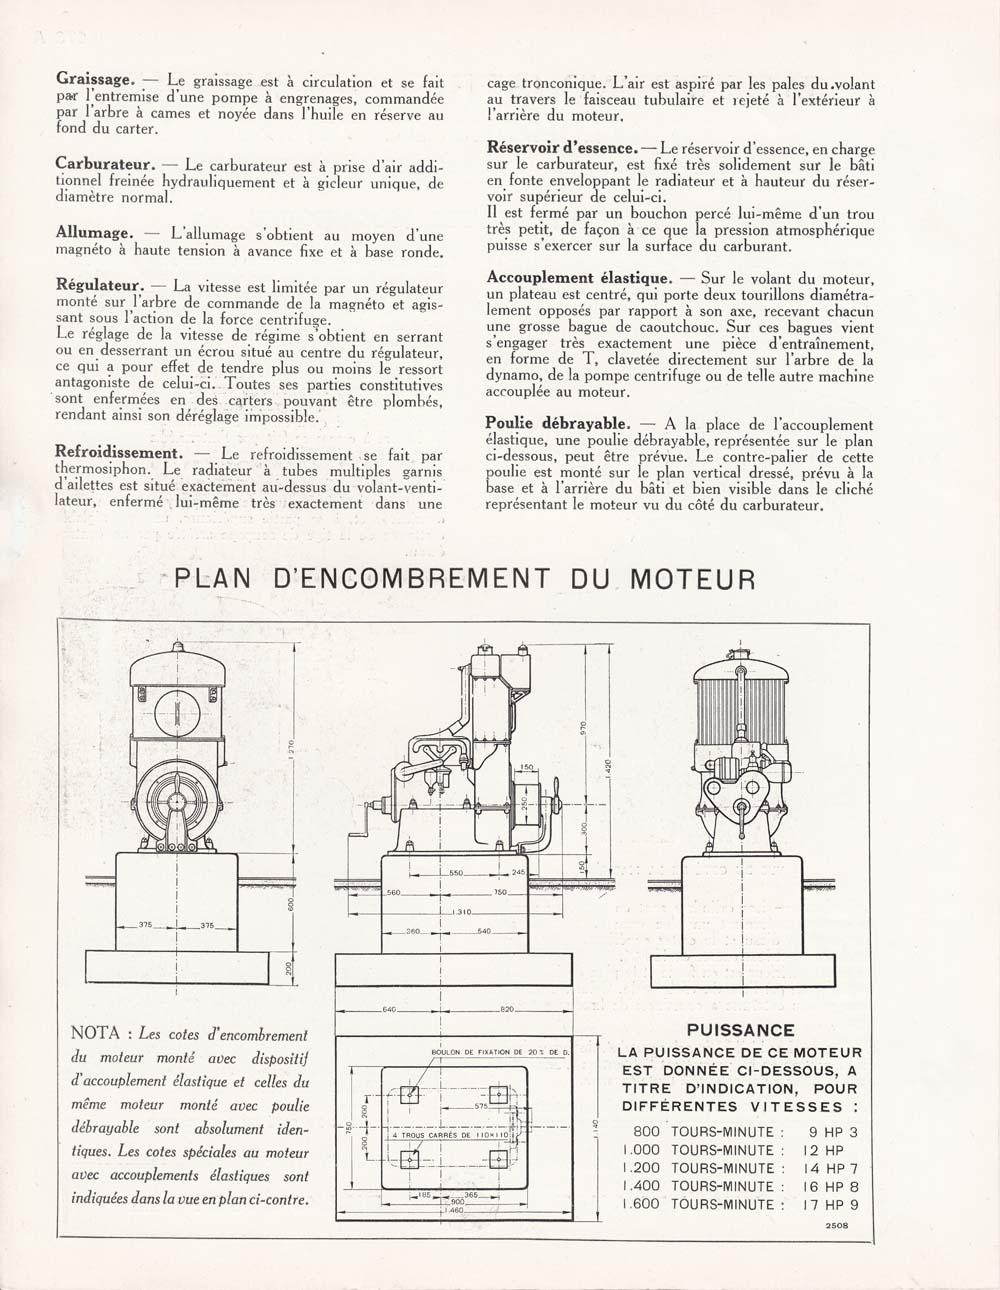 moteur_industriel_10cv_4cyl_2